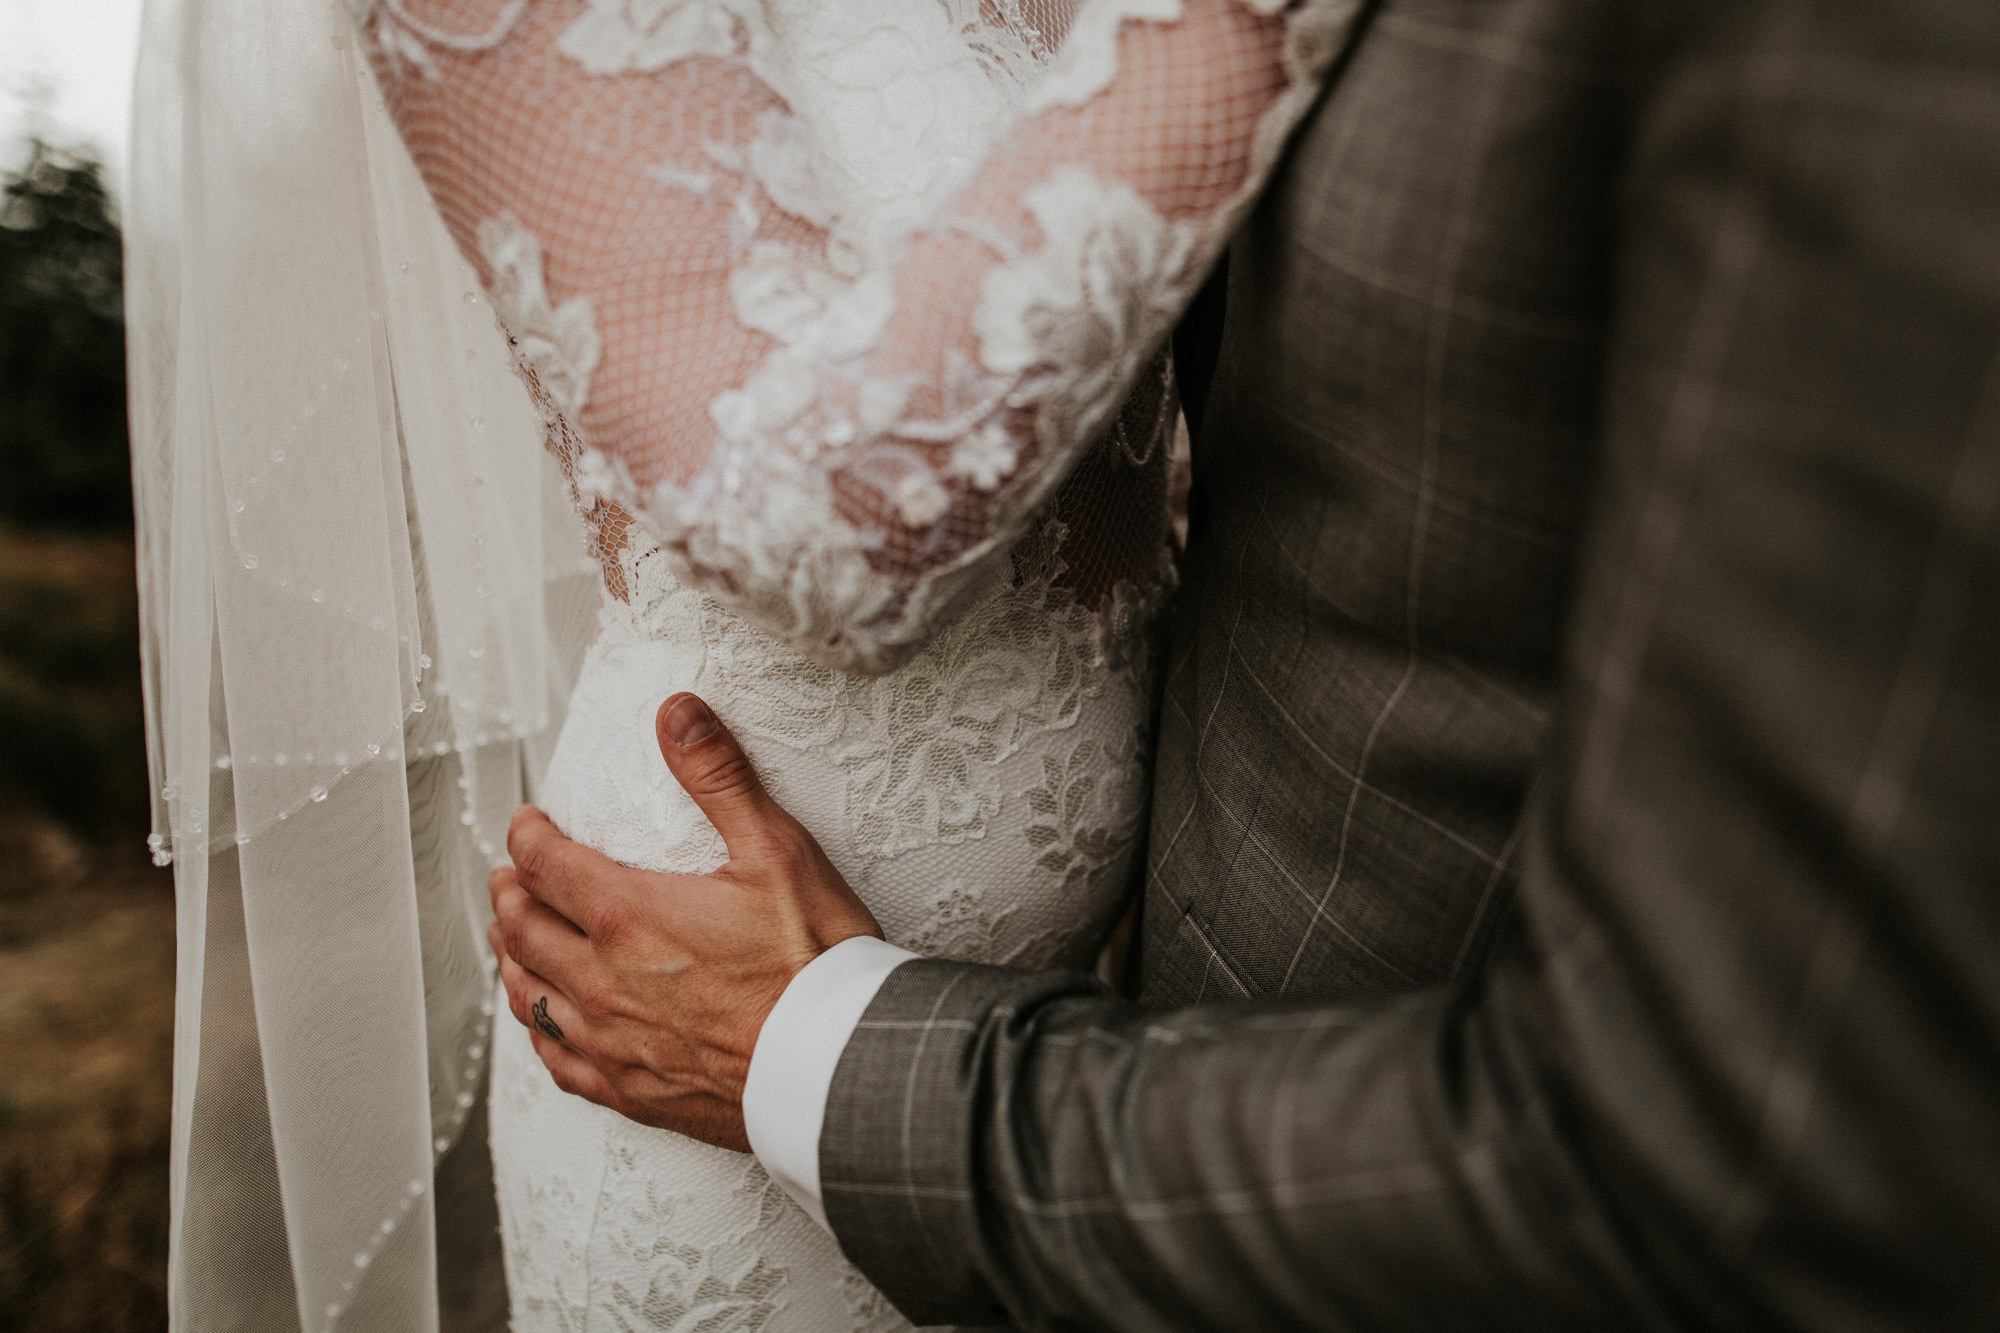 DanielaMarquardtPhotography_Hochzeitsfotograf_Düsseldorf_Köln_Mallorca_Bayern_Austria_Harz_LinaundMaik_Afterwedding-Shooting_Weddingphotographer_Ibiza_Tuskany_Italien_Toskana69